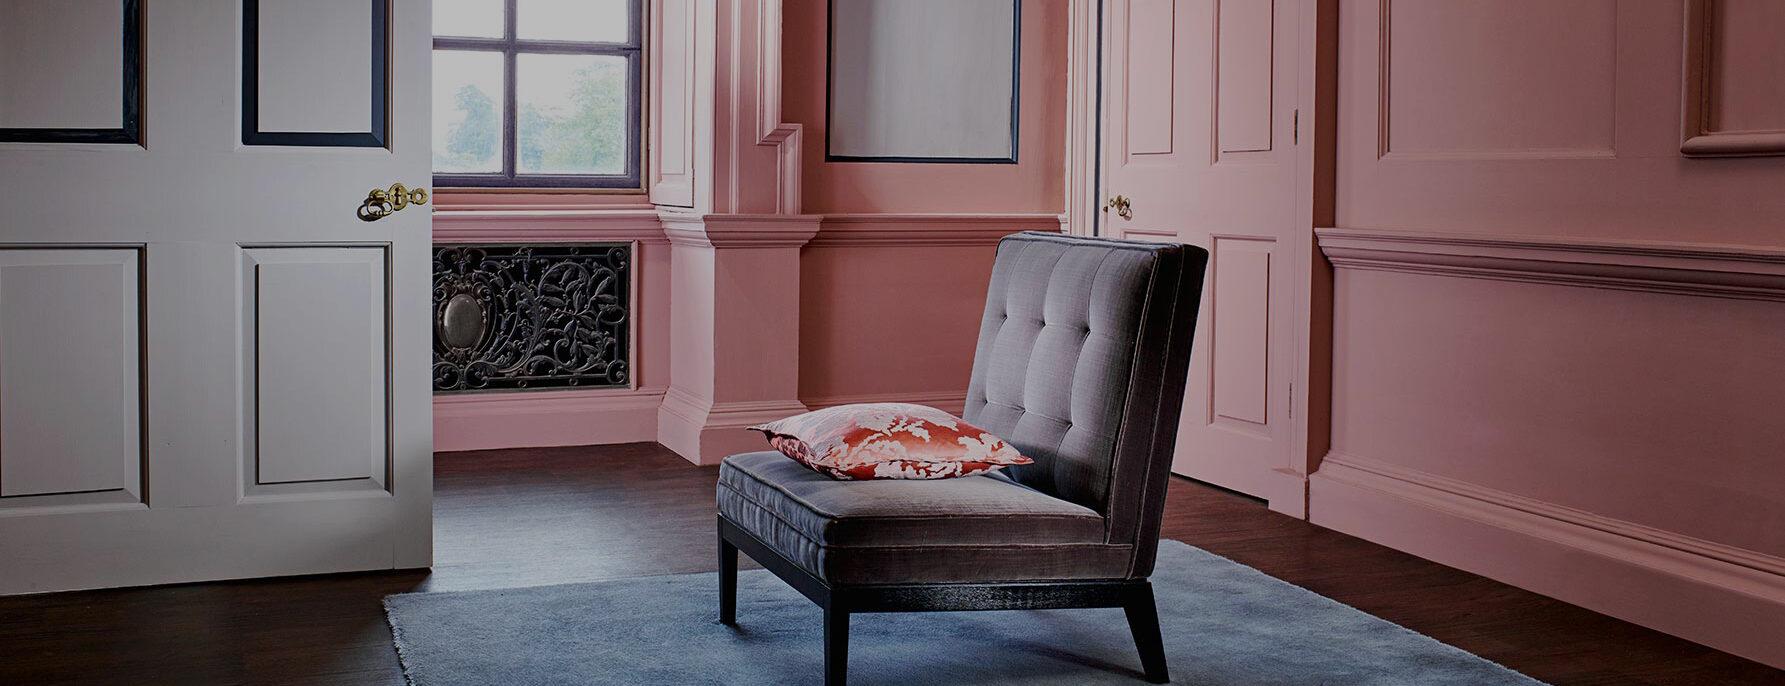 The Curtain Shop Oxford Interior Design